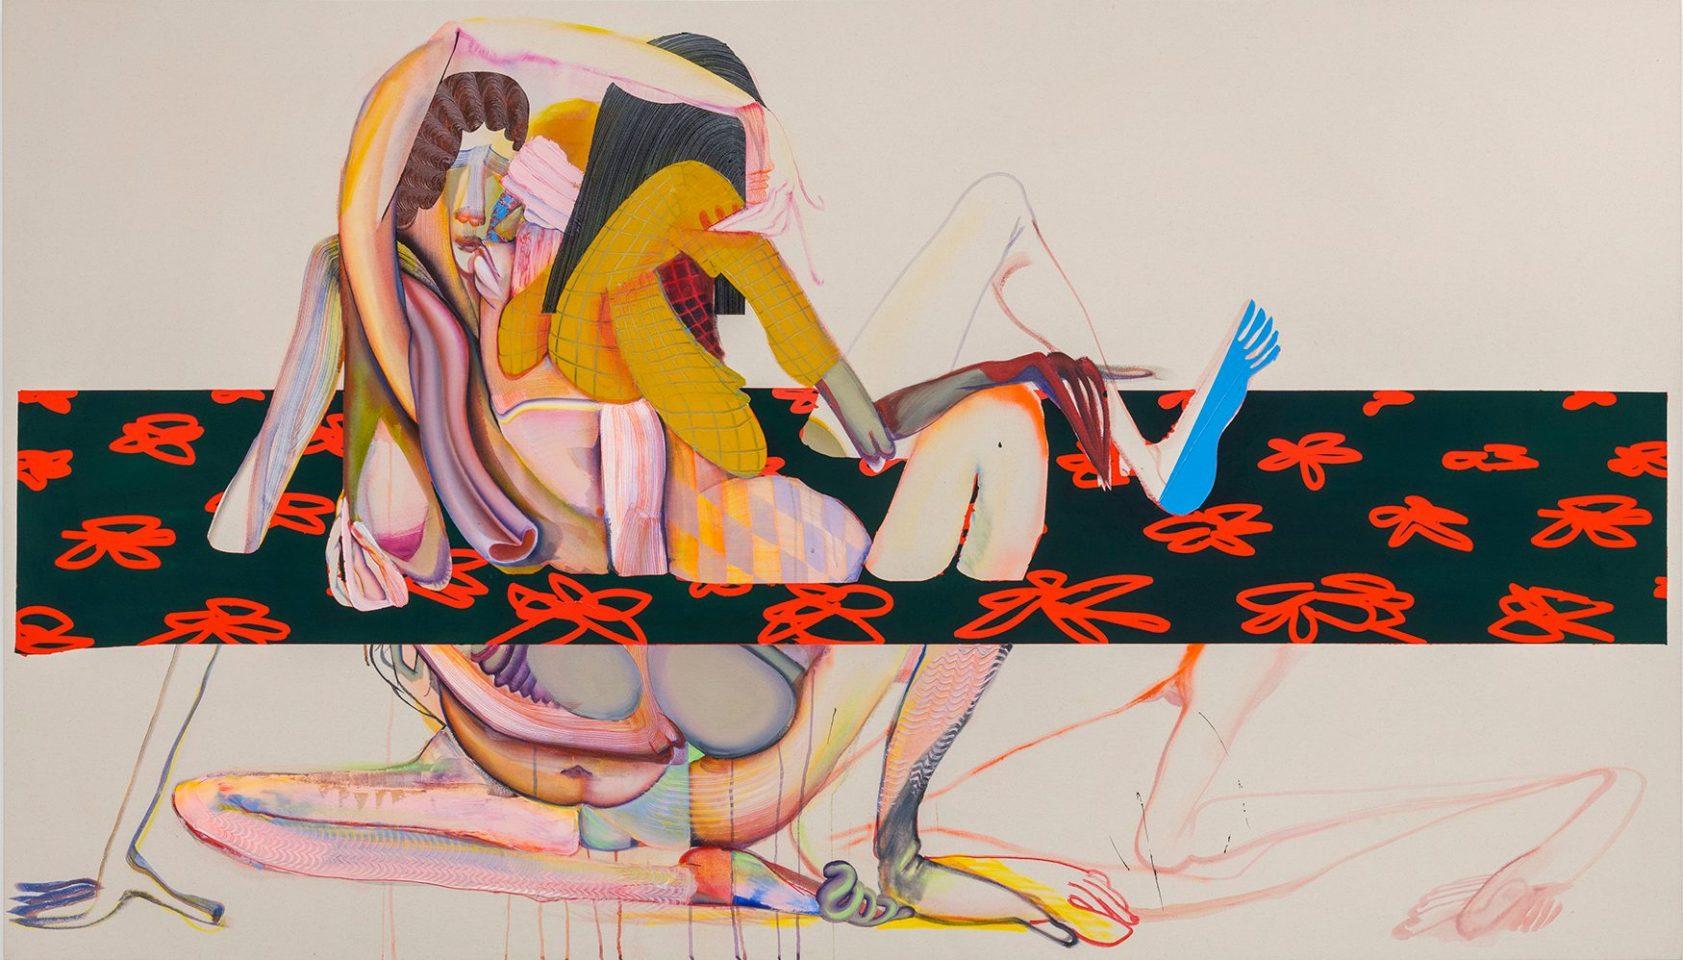 Christina Quarles: In Likeness